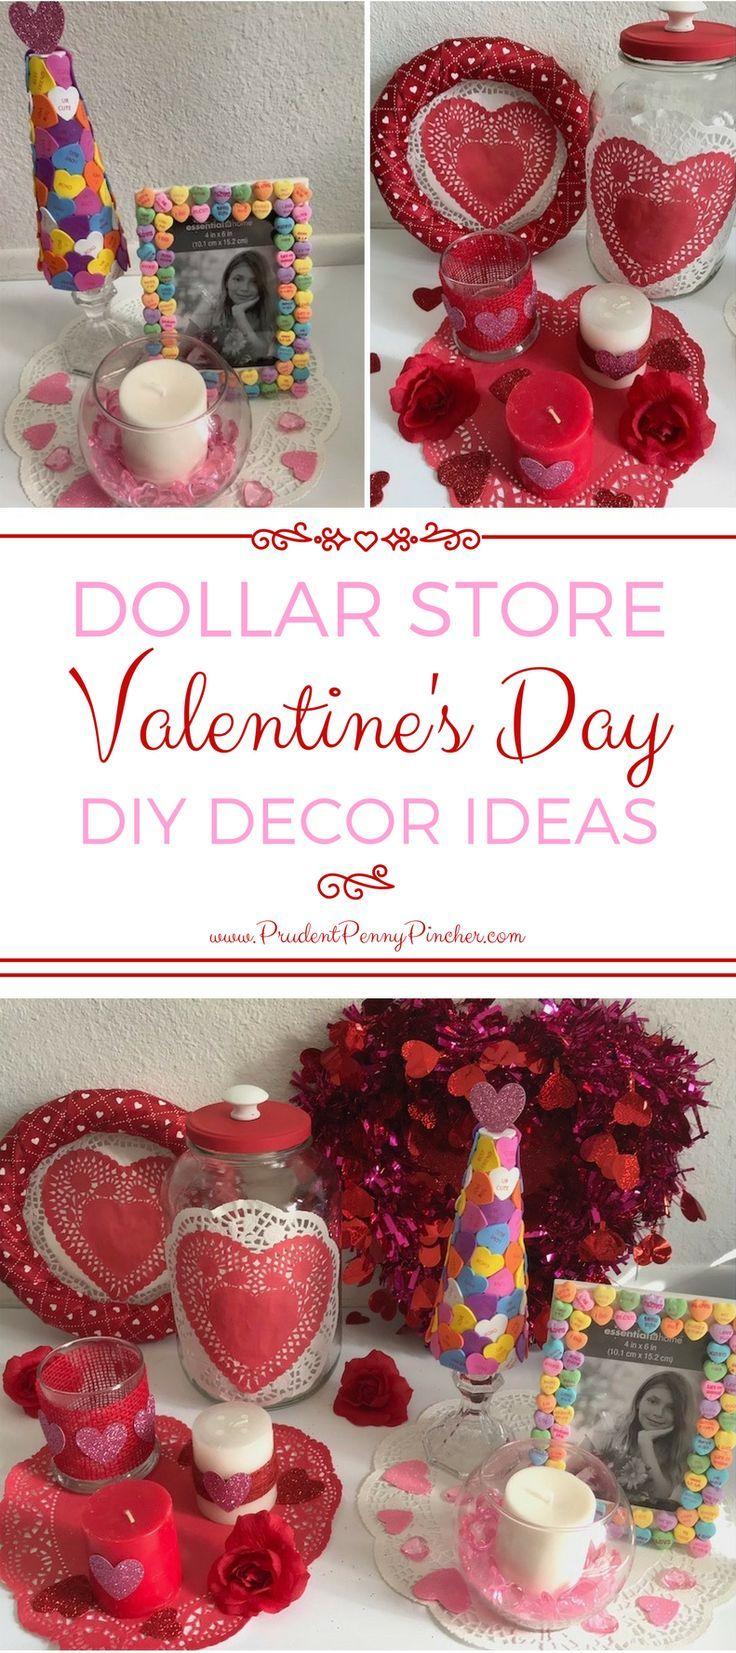 Dollar Store Valentineu0027s Day Decor Ideas 95